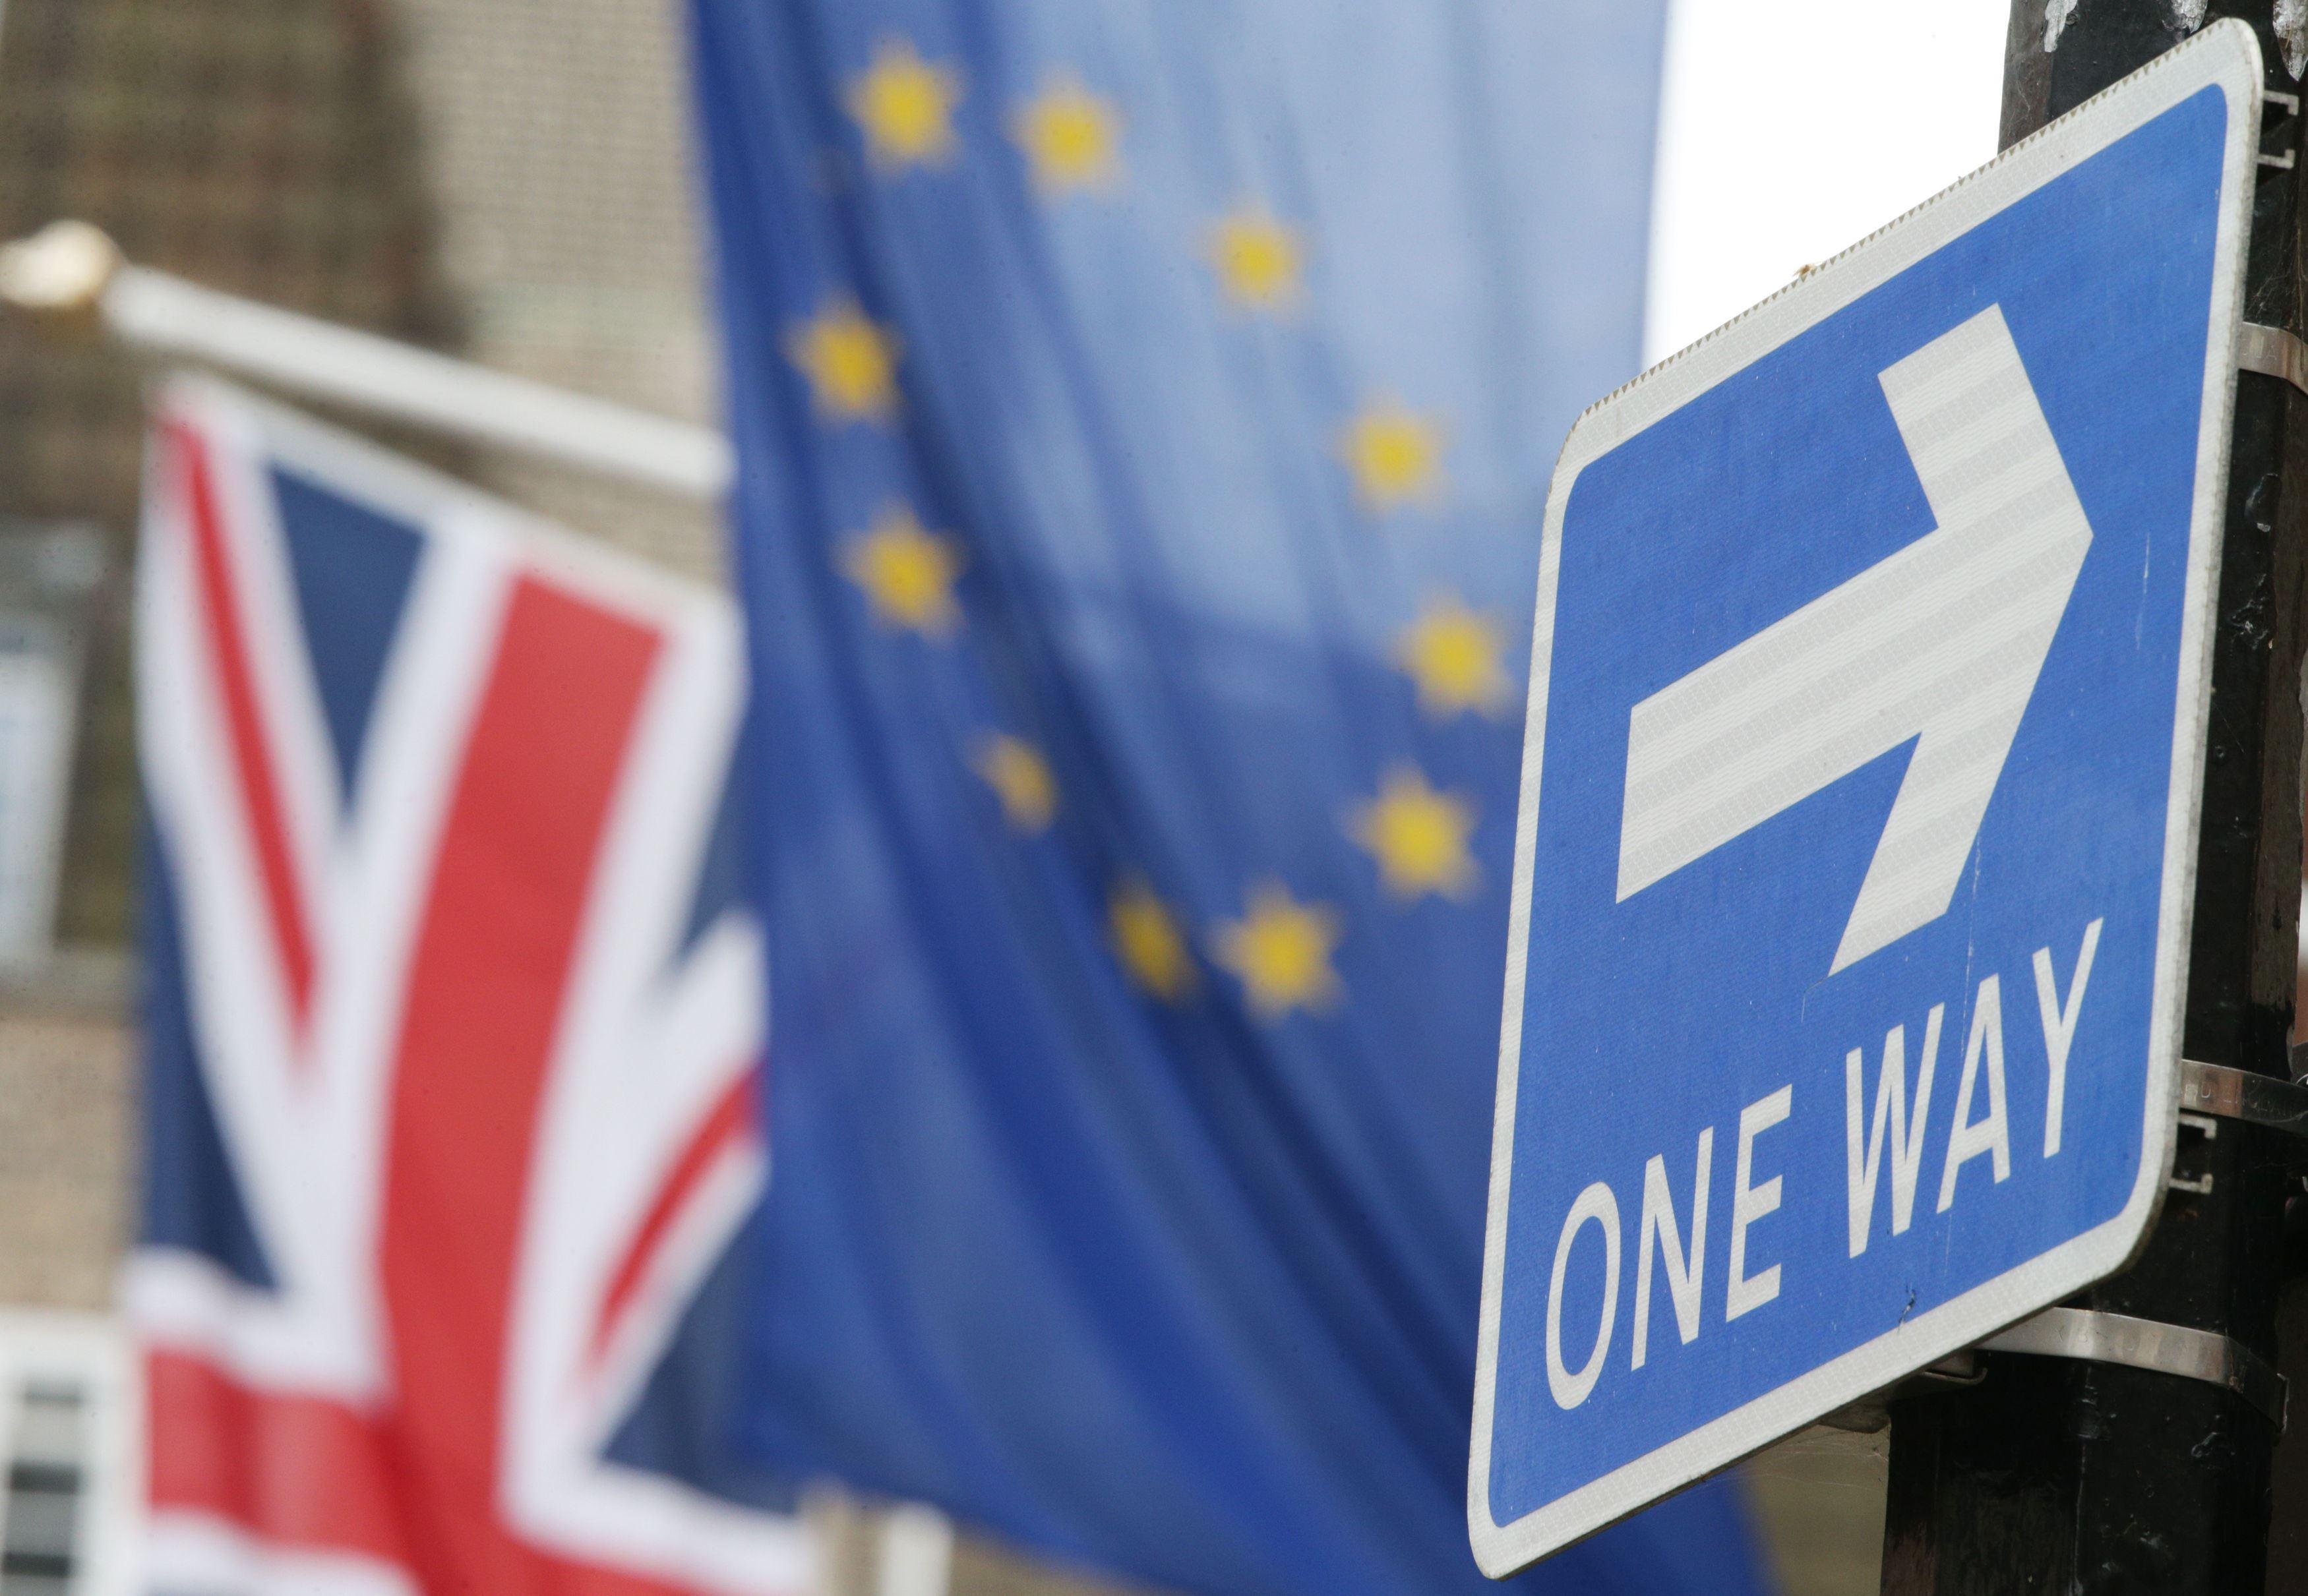 Roger Daltrey denies changing Brexit views after signing music visa letter